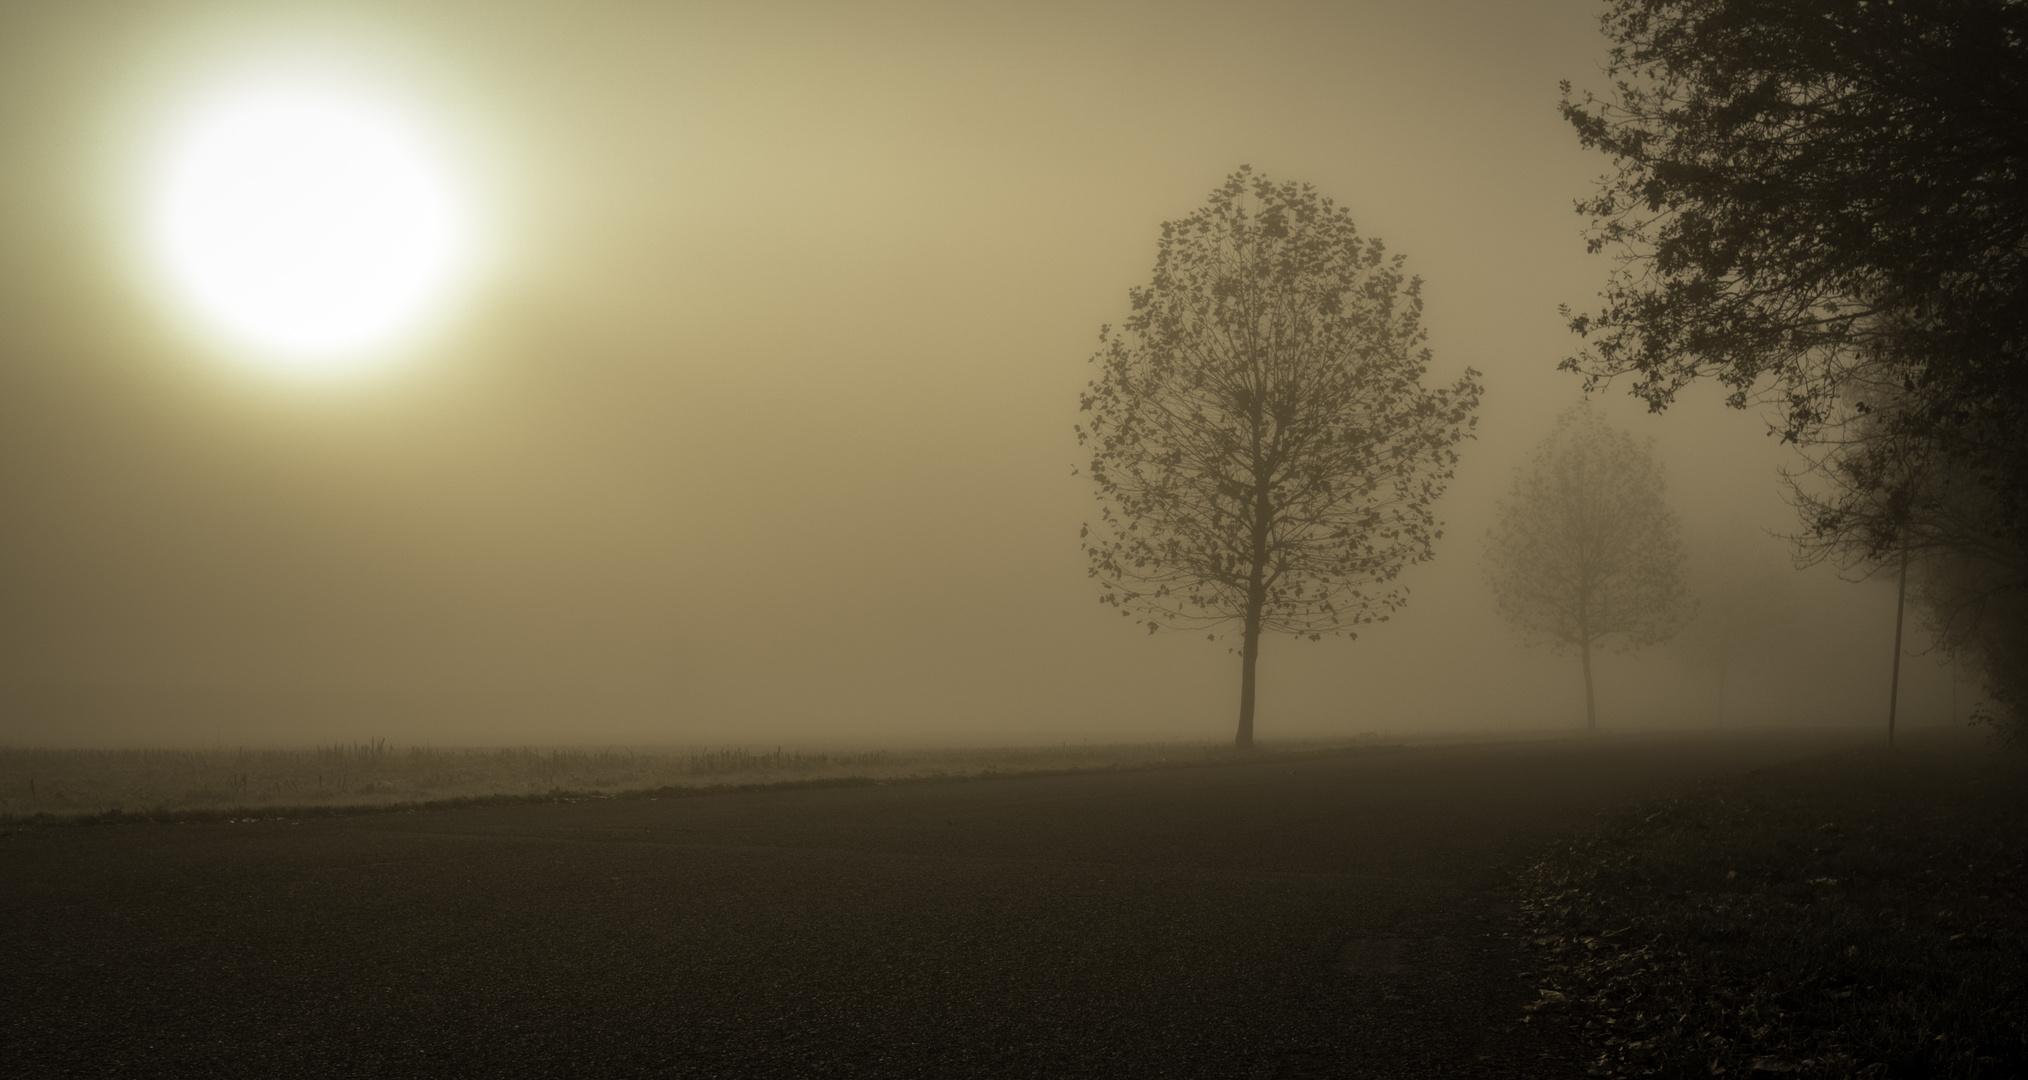 Ce matin, près de Strasbourg...